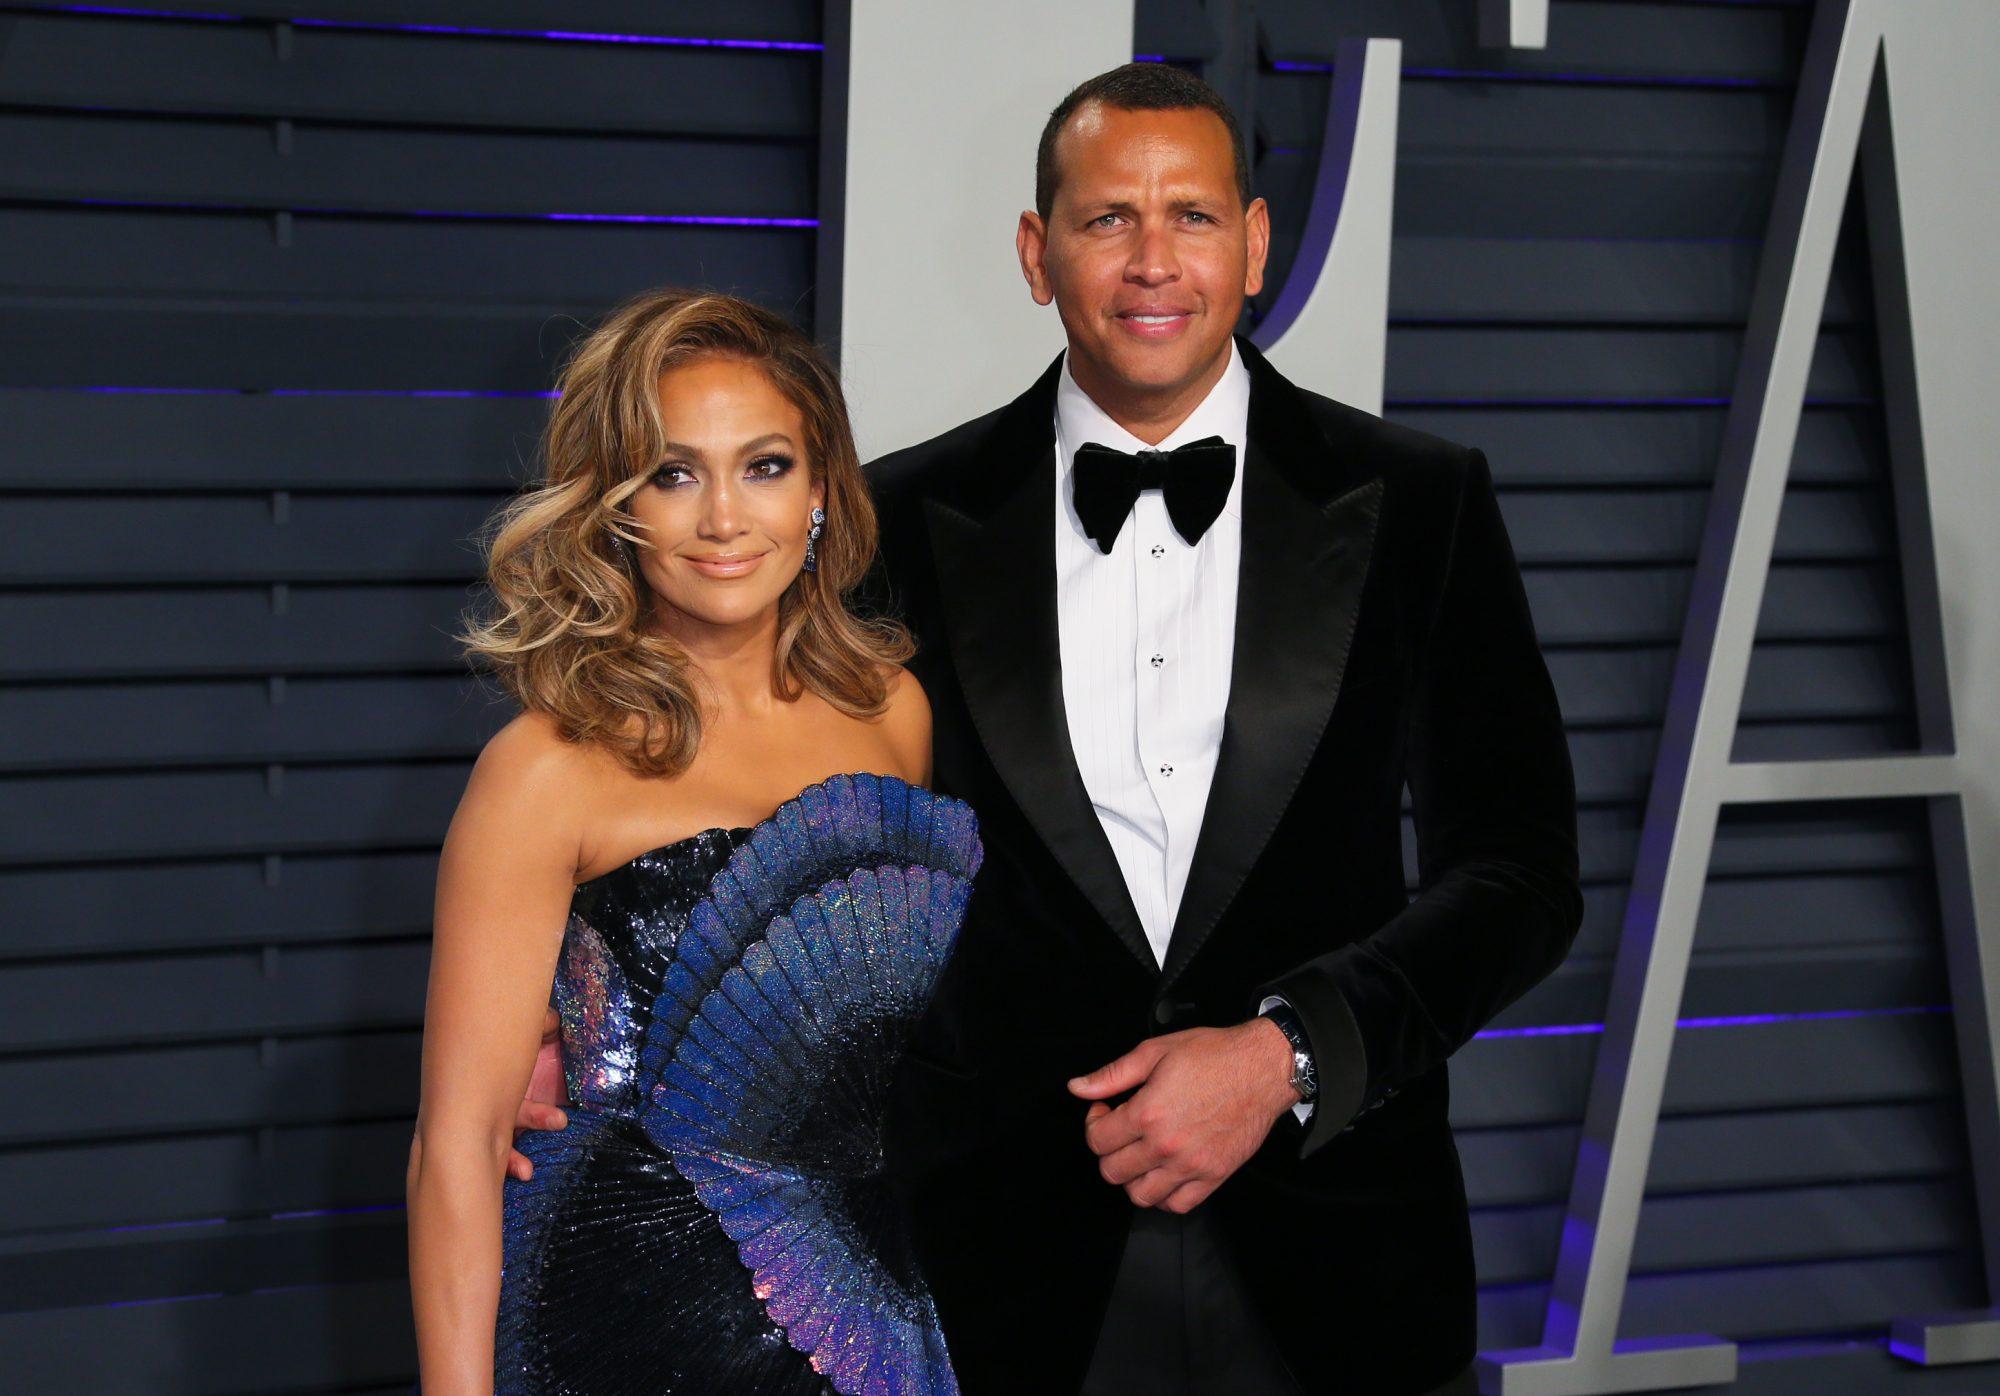 Jennifer Lopez and former pro-baseball player Alex Rodriguez attend the 2019 Vanity Fair Oscar